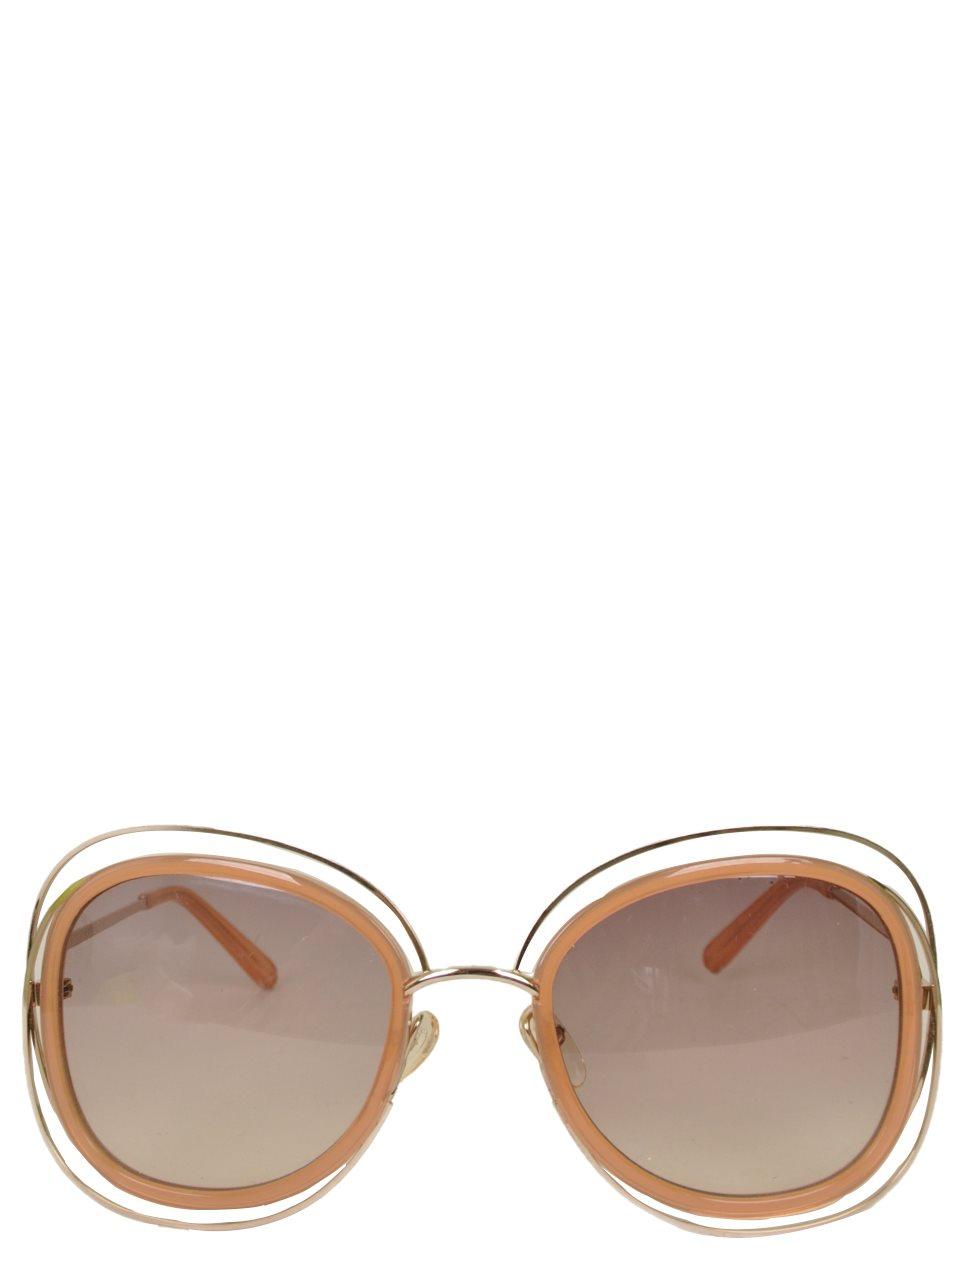 Chloe - Sunglasses